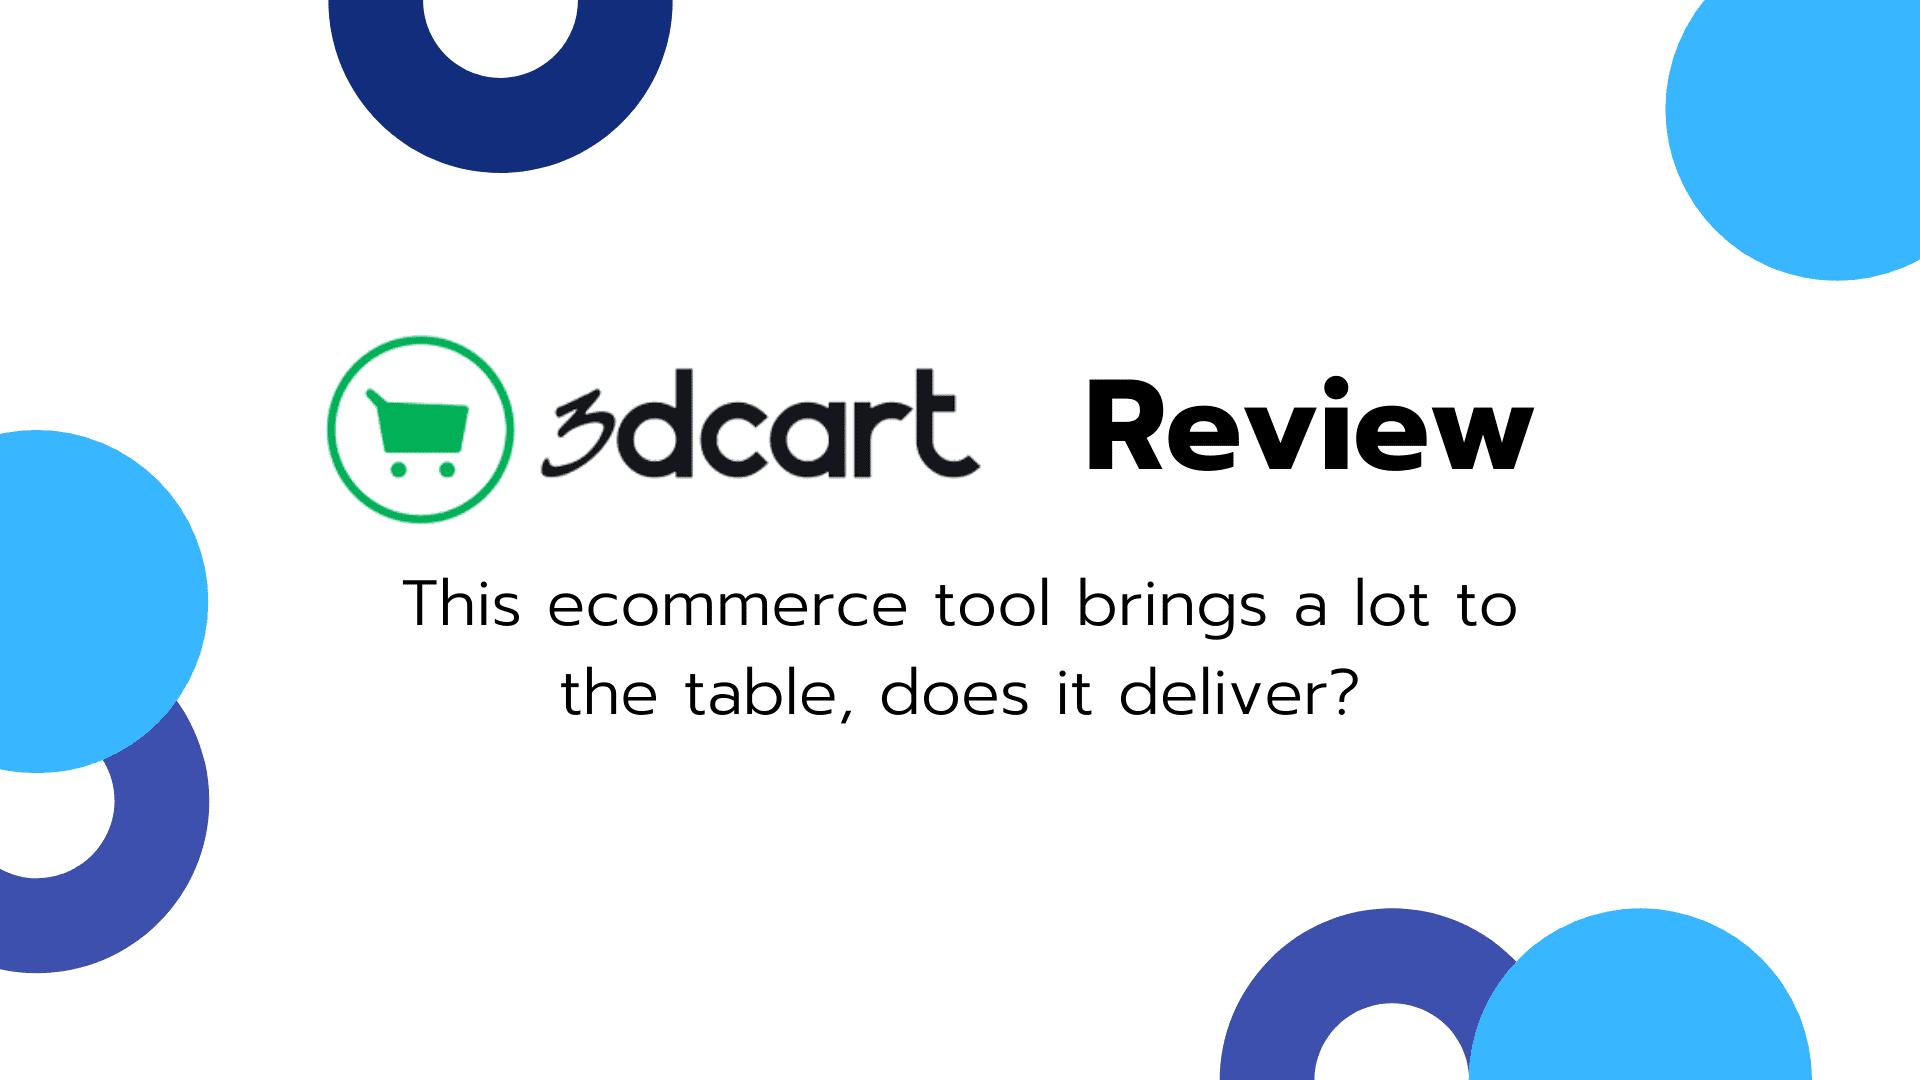 3dcart Review